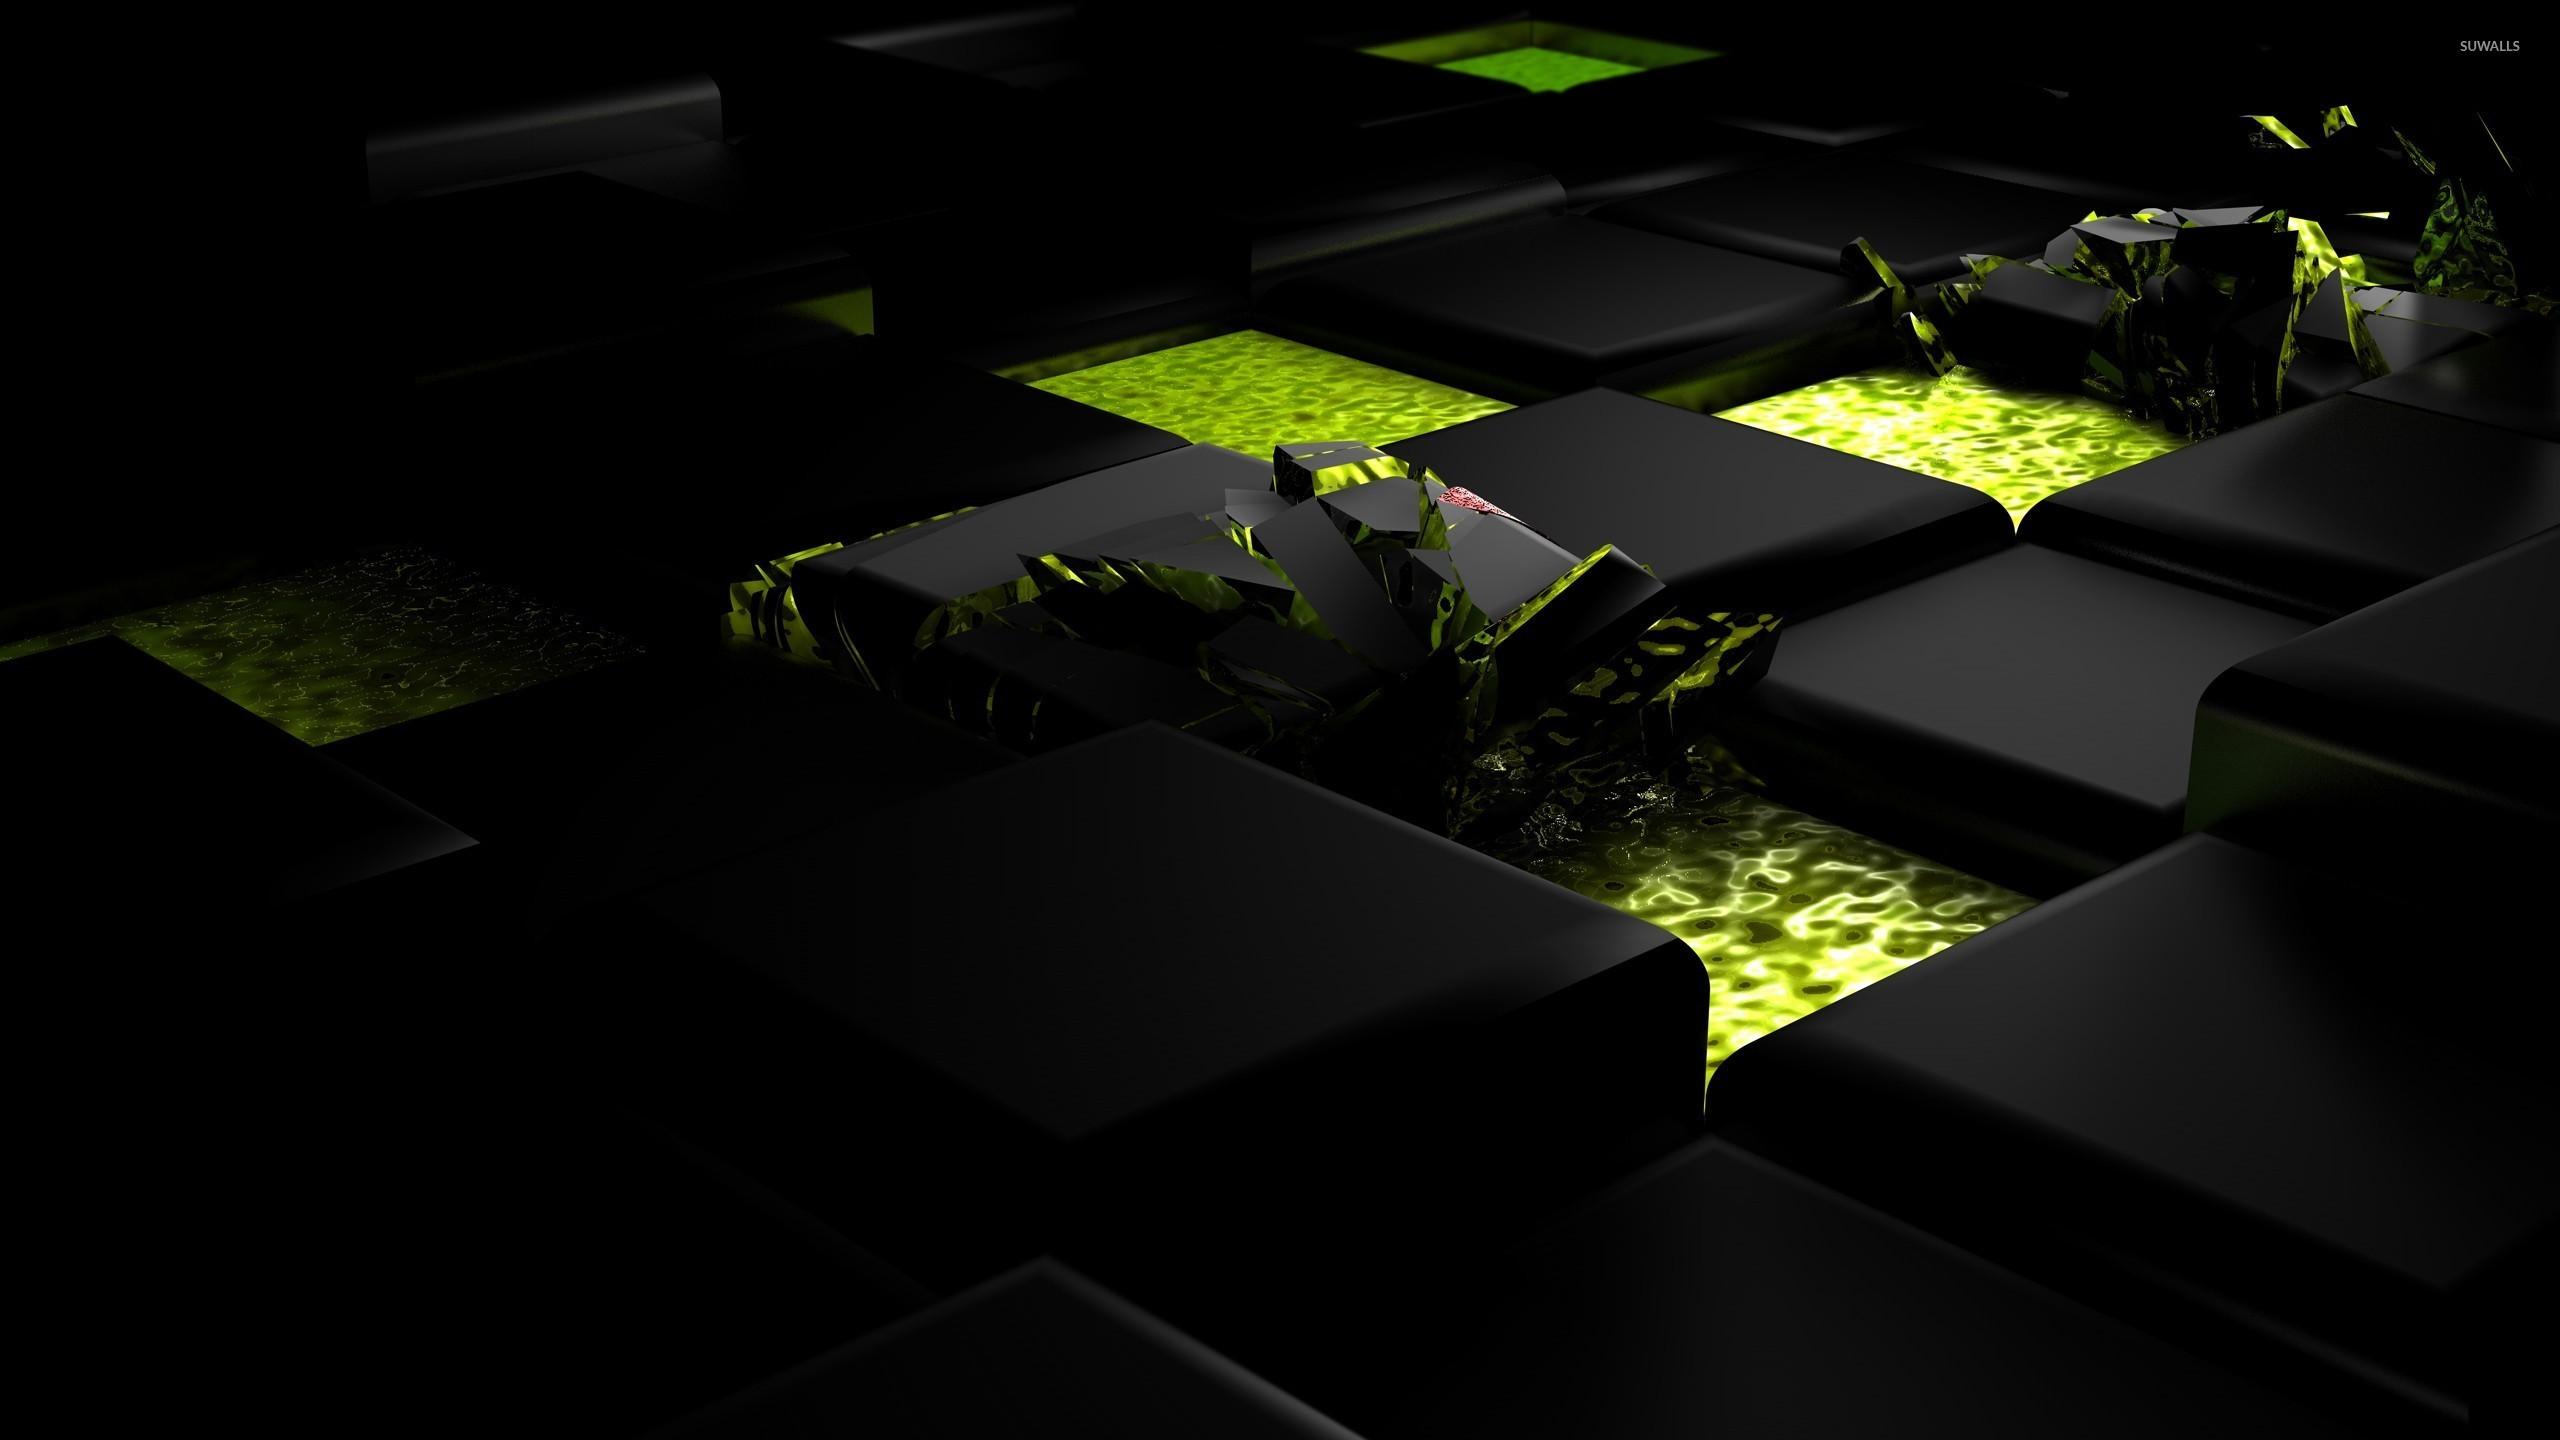 cube computer wallpapers desktop - photo #27